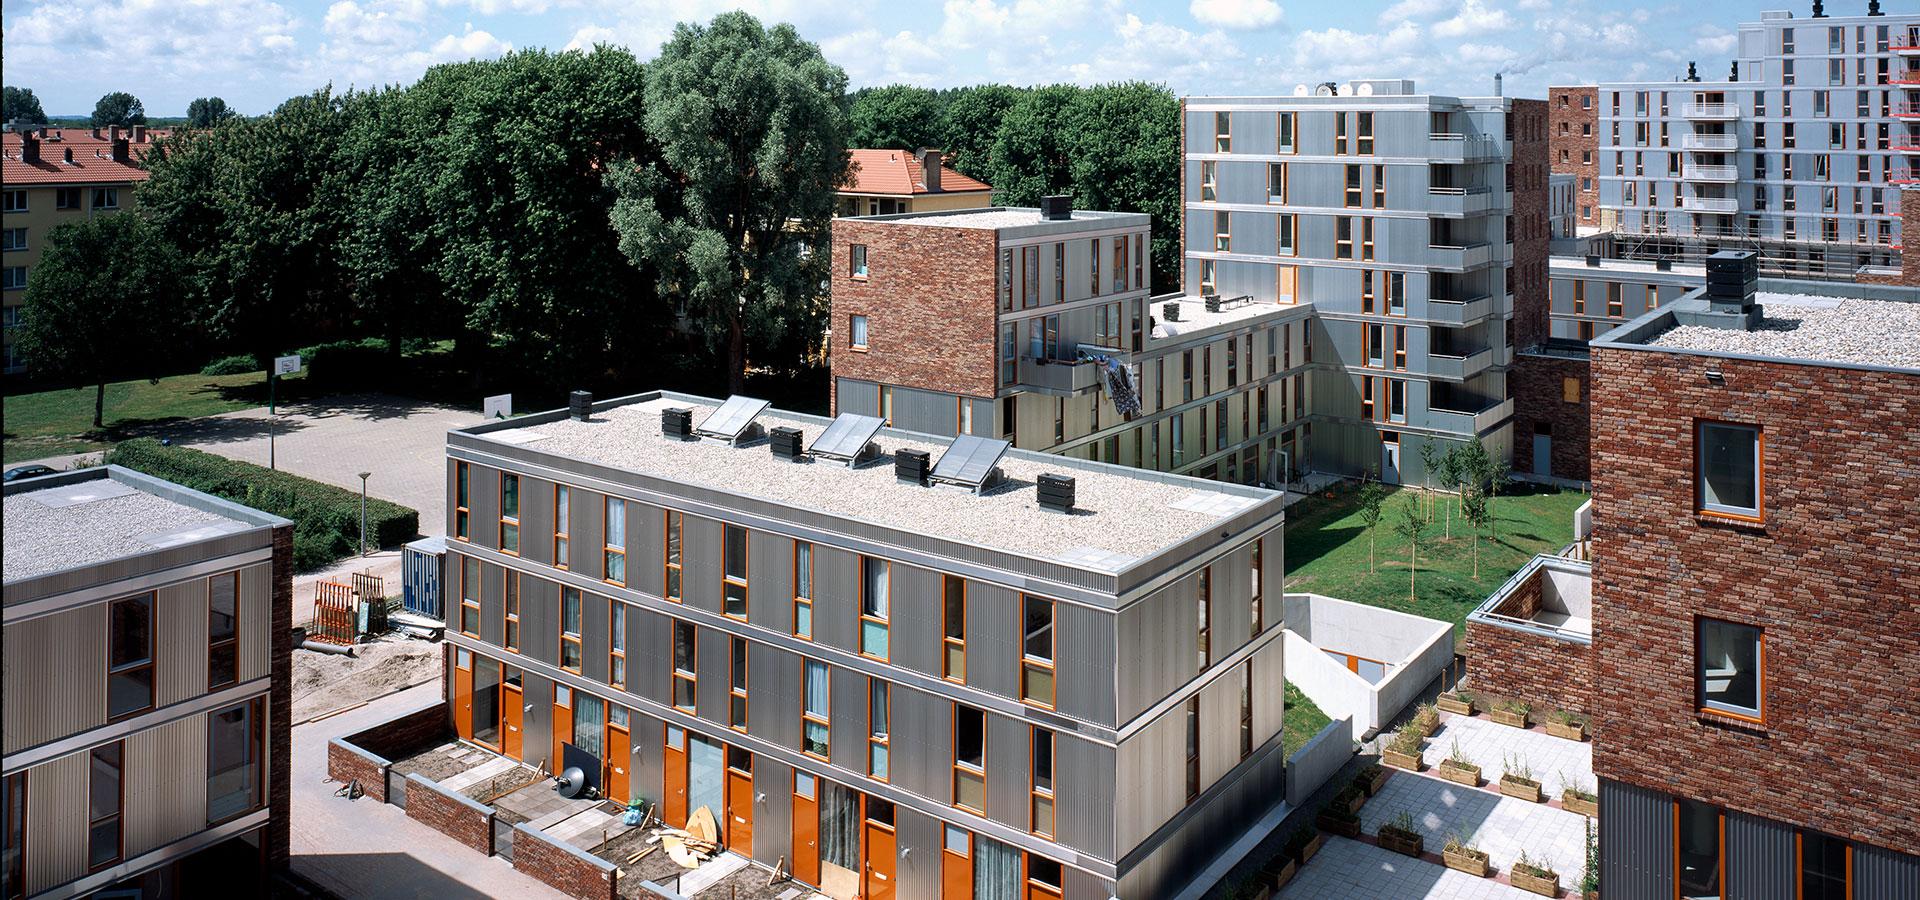 FARO architecten Geuzentuinen Amsterdam 05